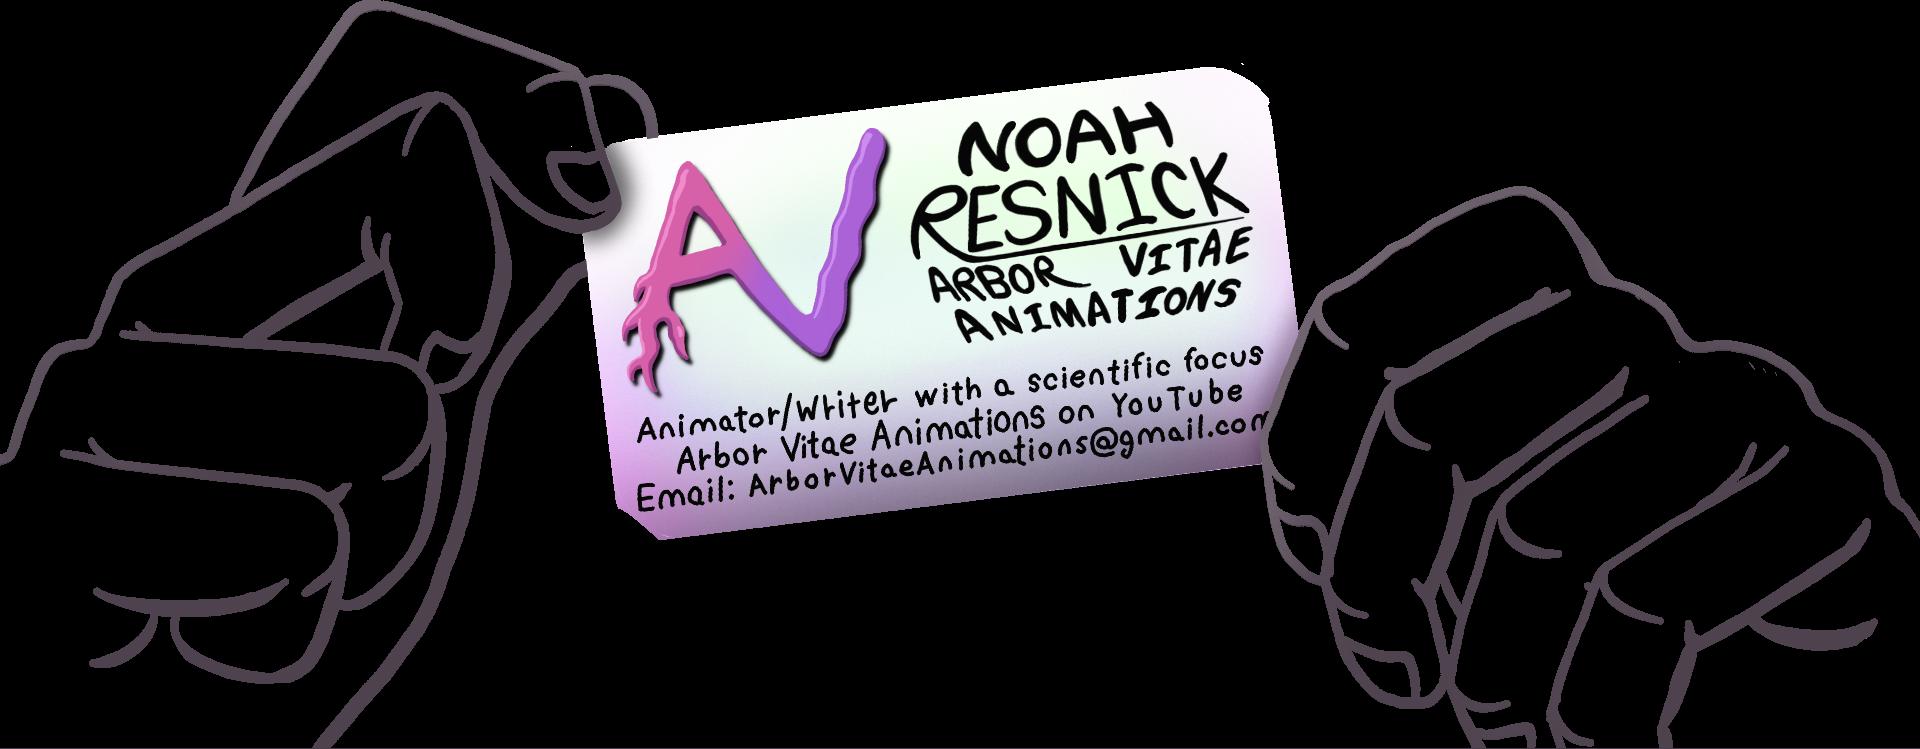 Noah Resnick, Arbor Vitae Animations, arborvitaeanimations@gmail.com